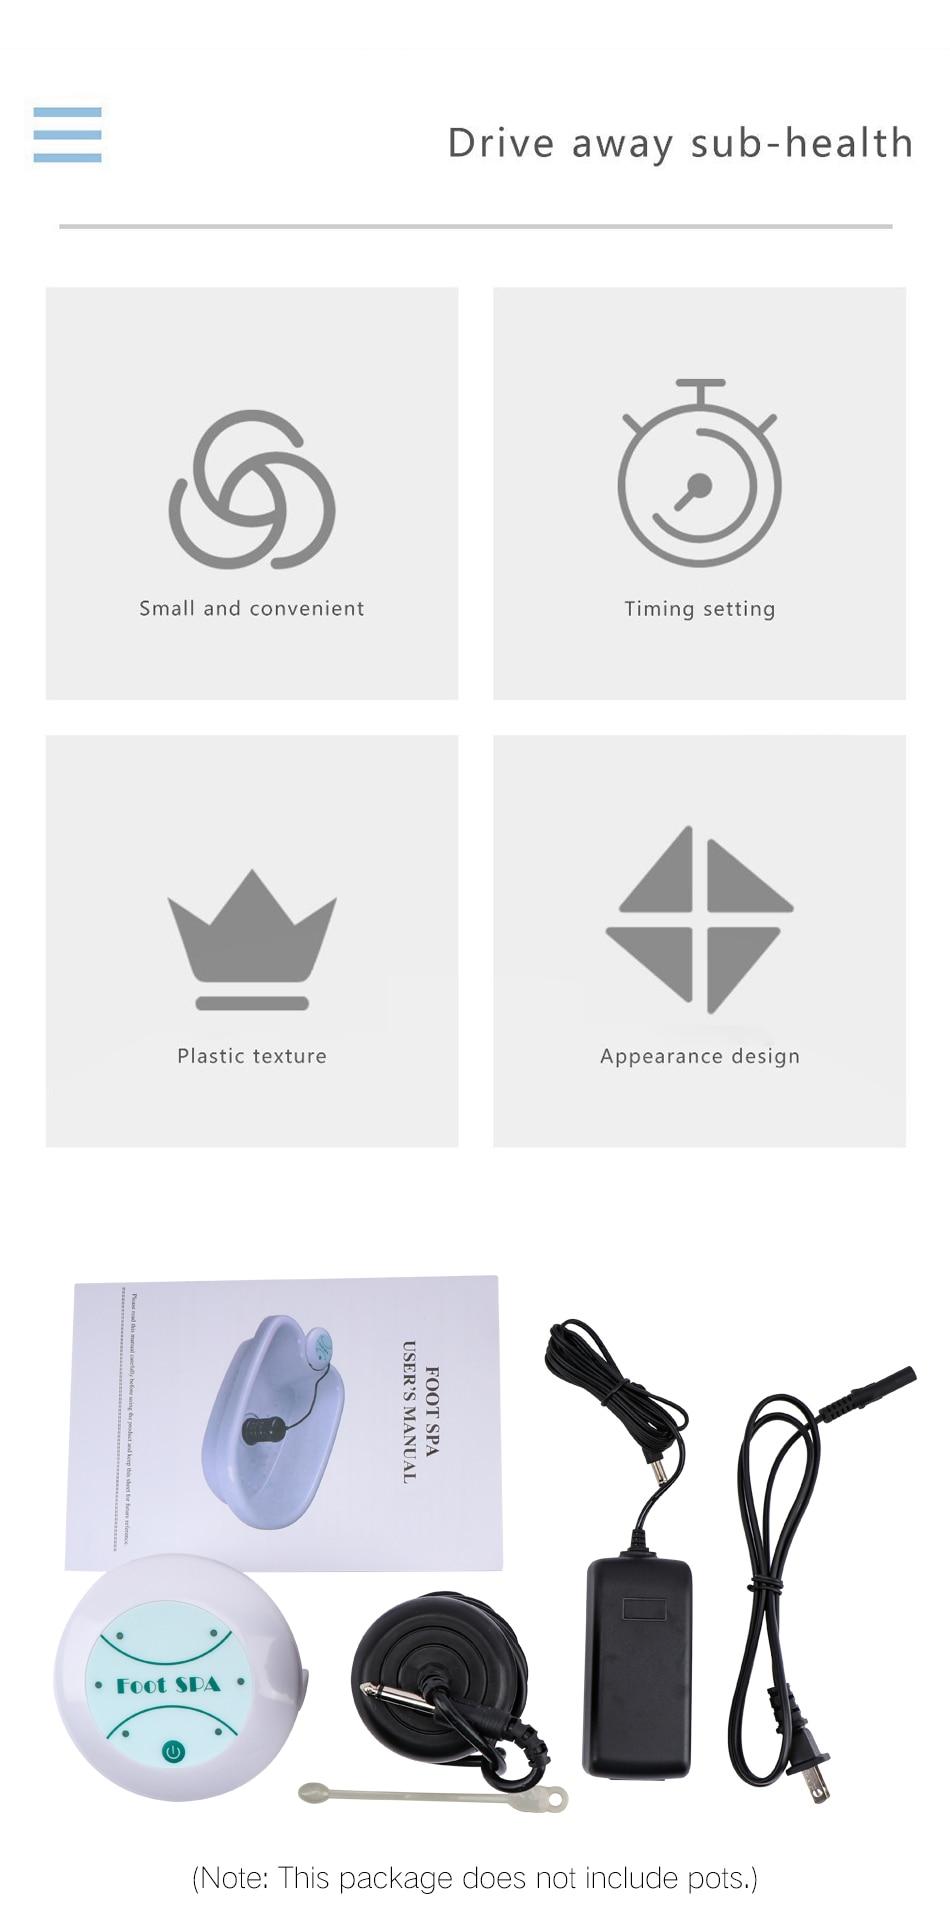 Home Ion Cleanse Detox Foot Spa Plastic Foot Tub Bucket Foot Bath Detox Device Ionic Detox Machine Men Women Health Care Tools